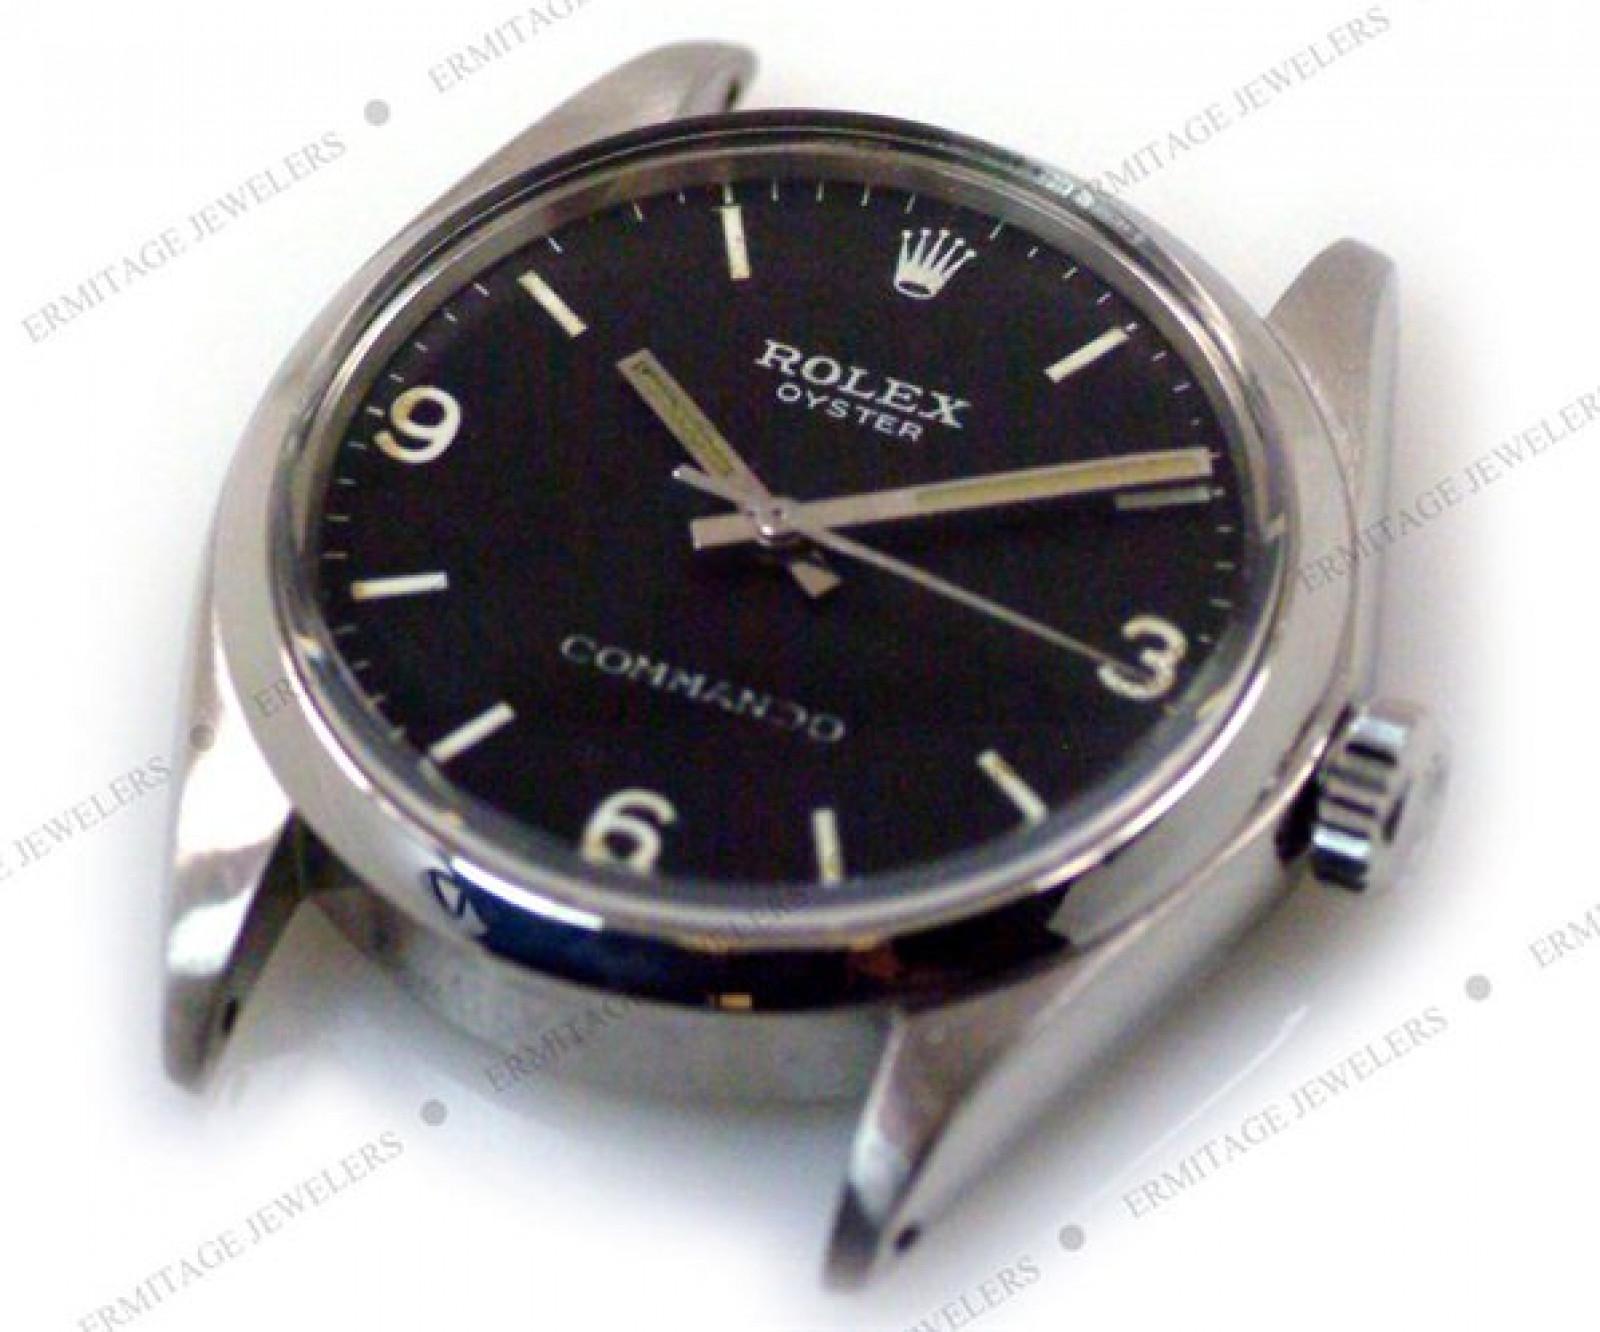 Vintage Rolex Commando 6429 Steel